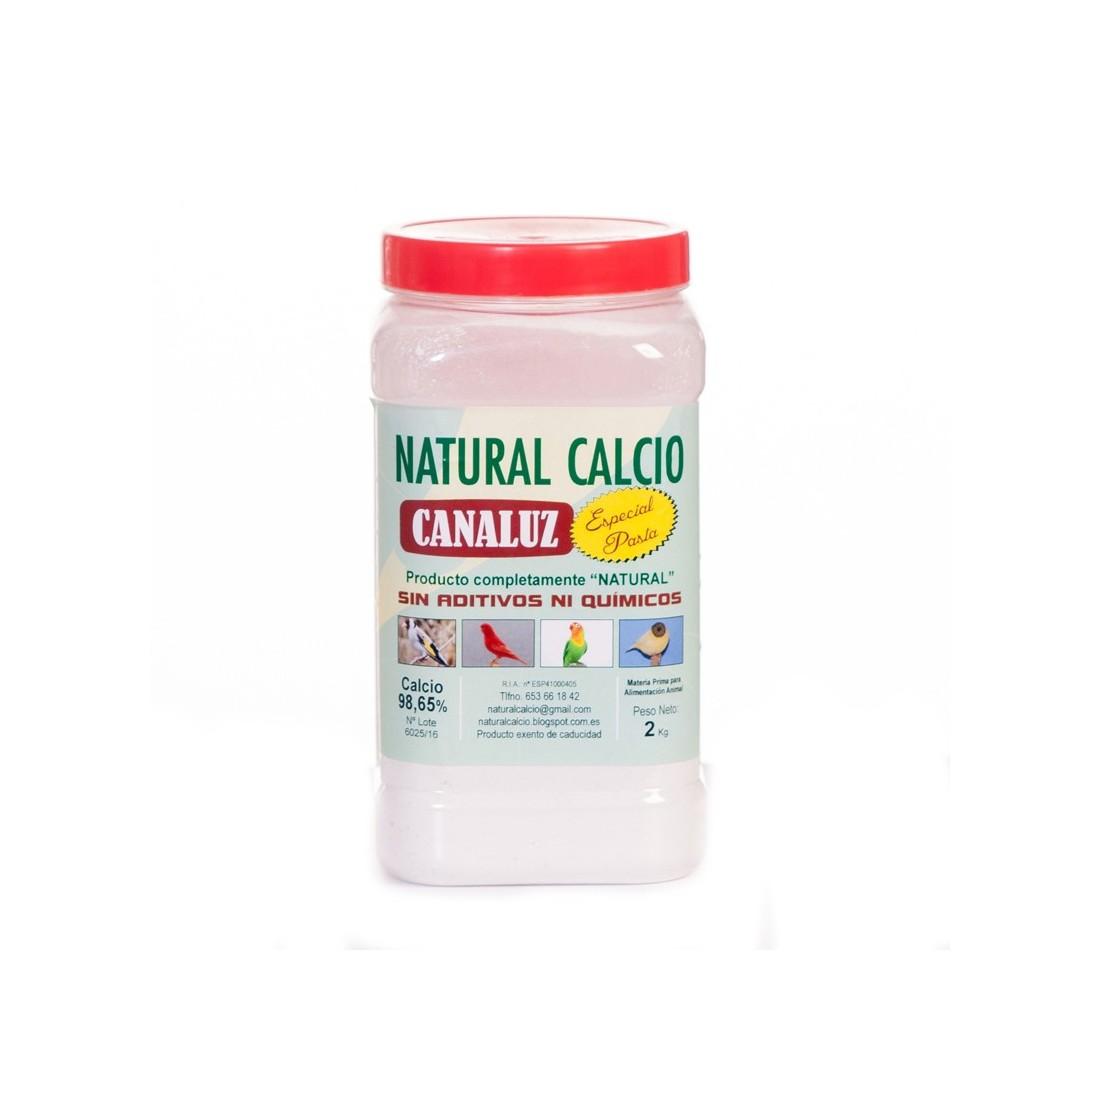 NATURAL CALCIO G00 2KG  - ESPECIAL PASTA -